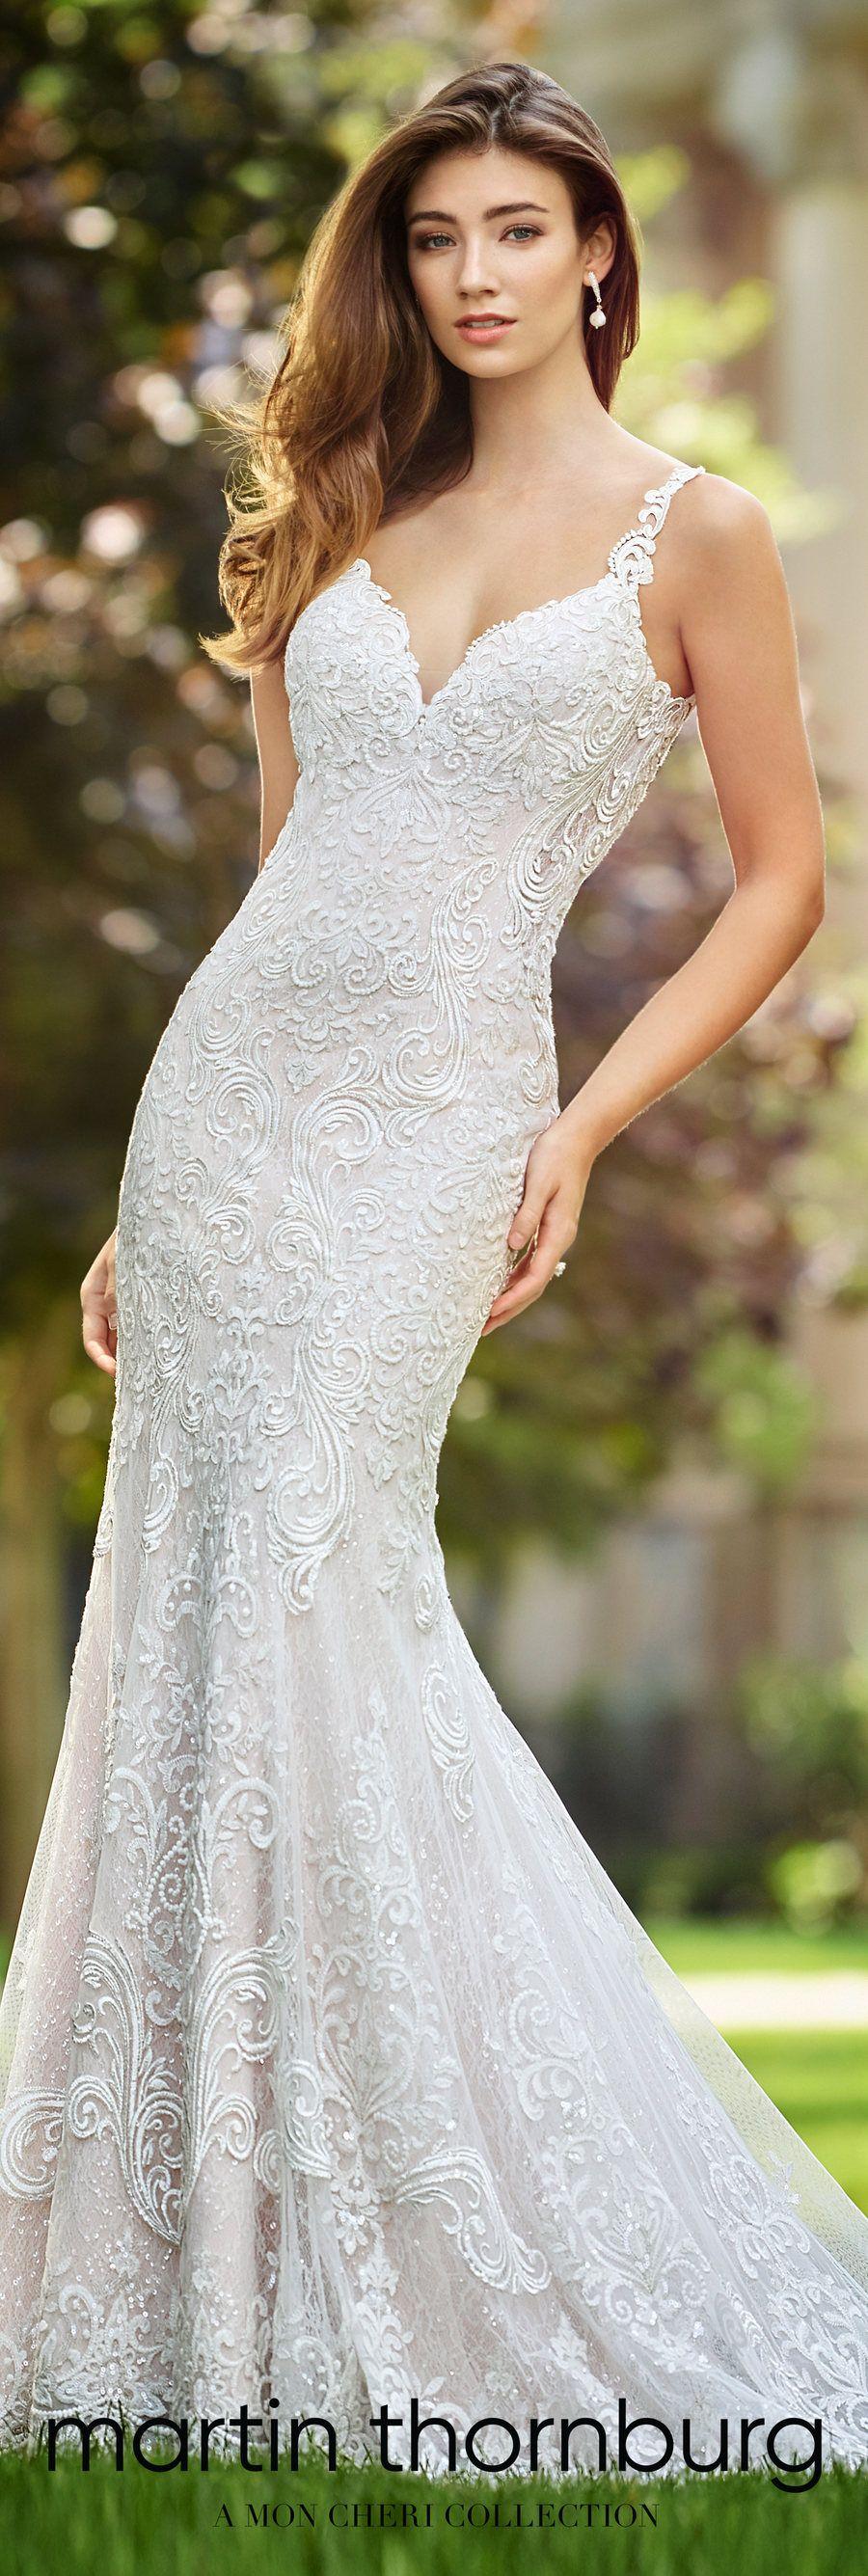 World exclusive wedding dresses spring by martin thornburg a